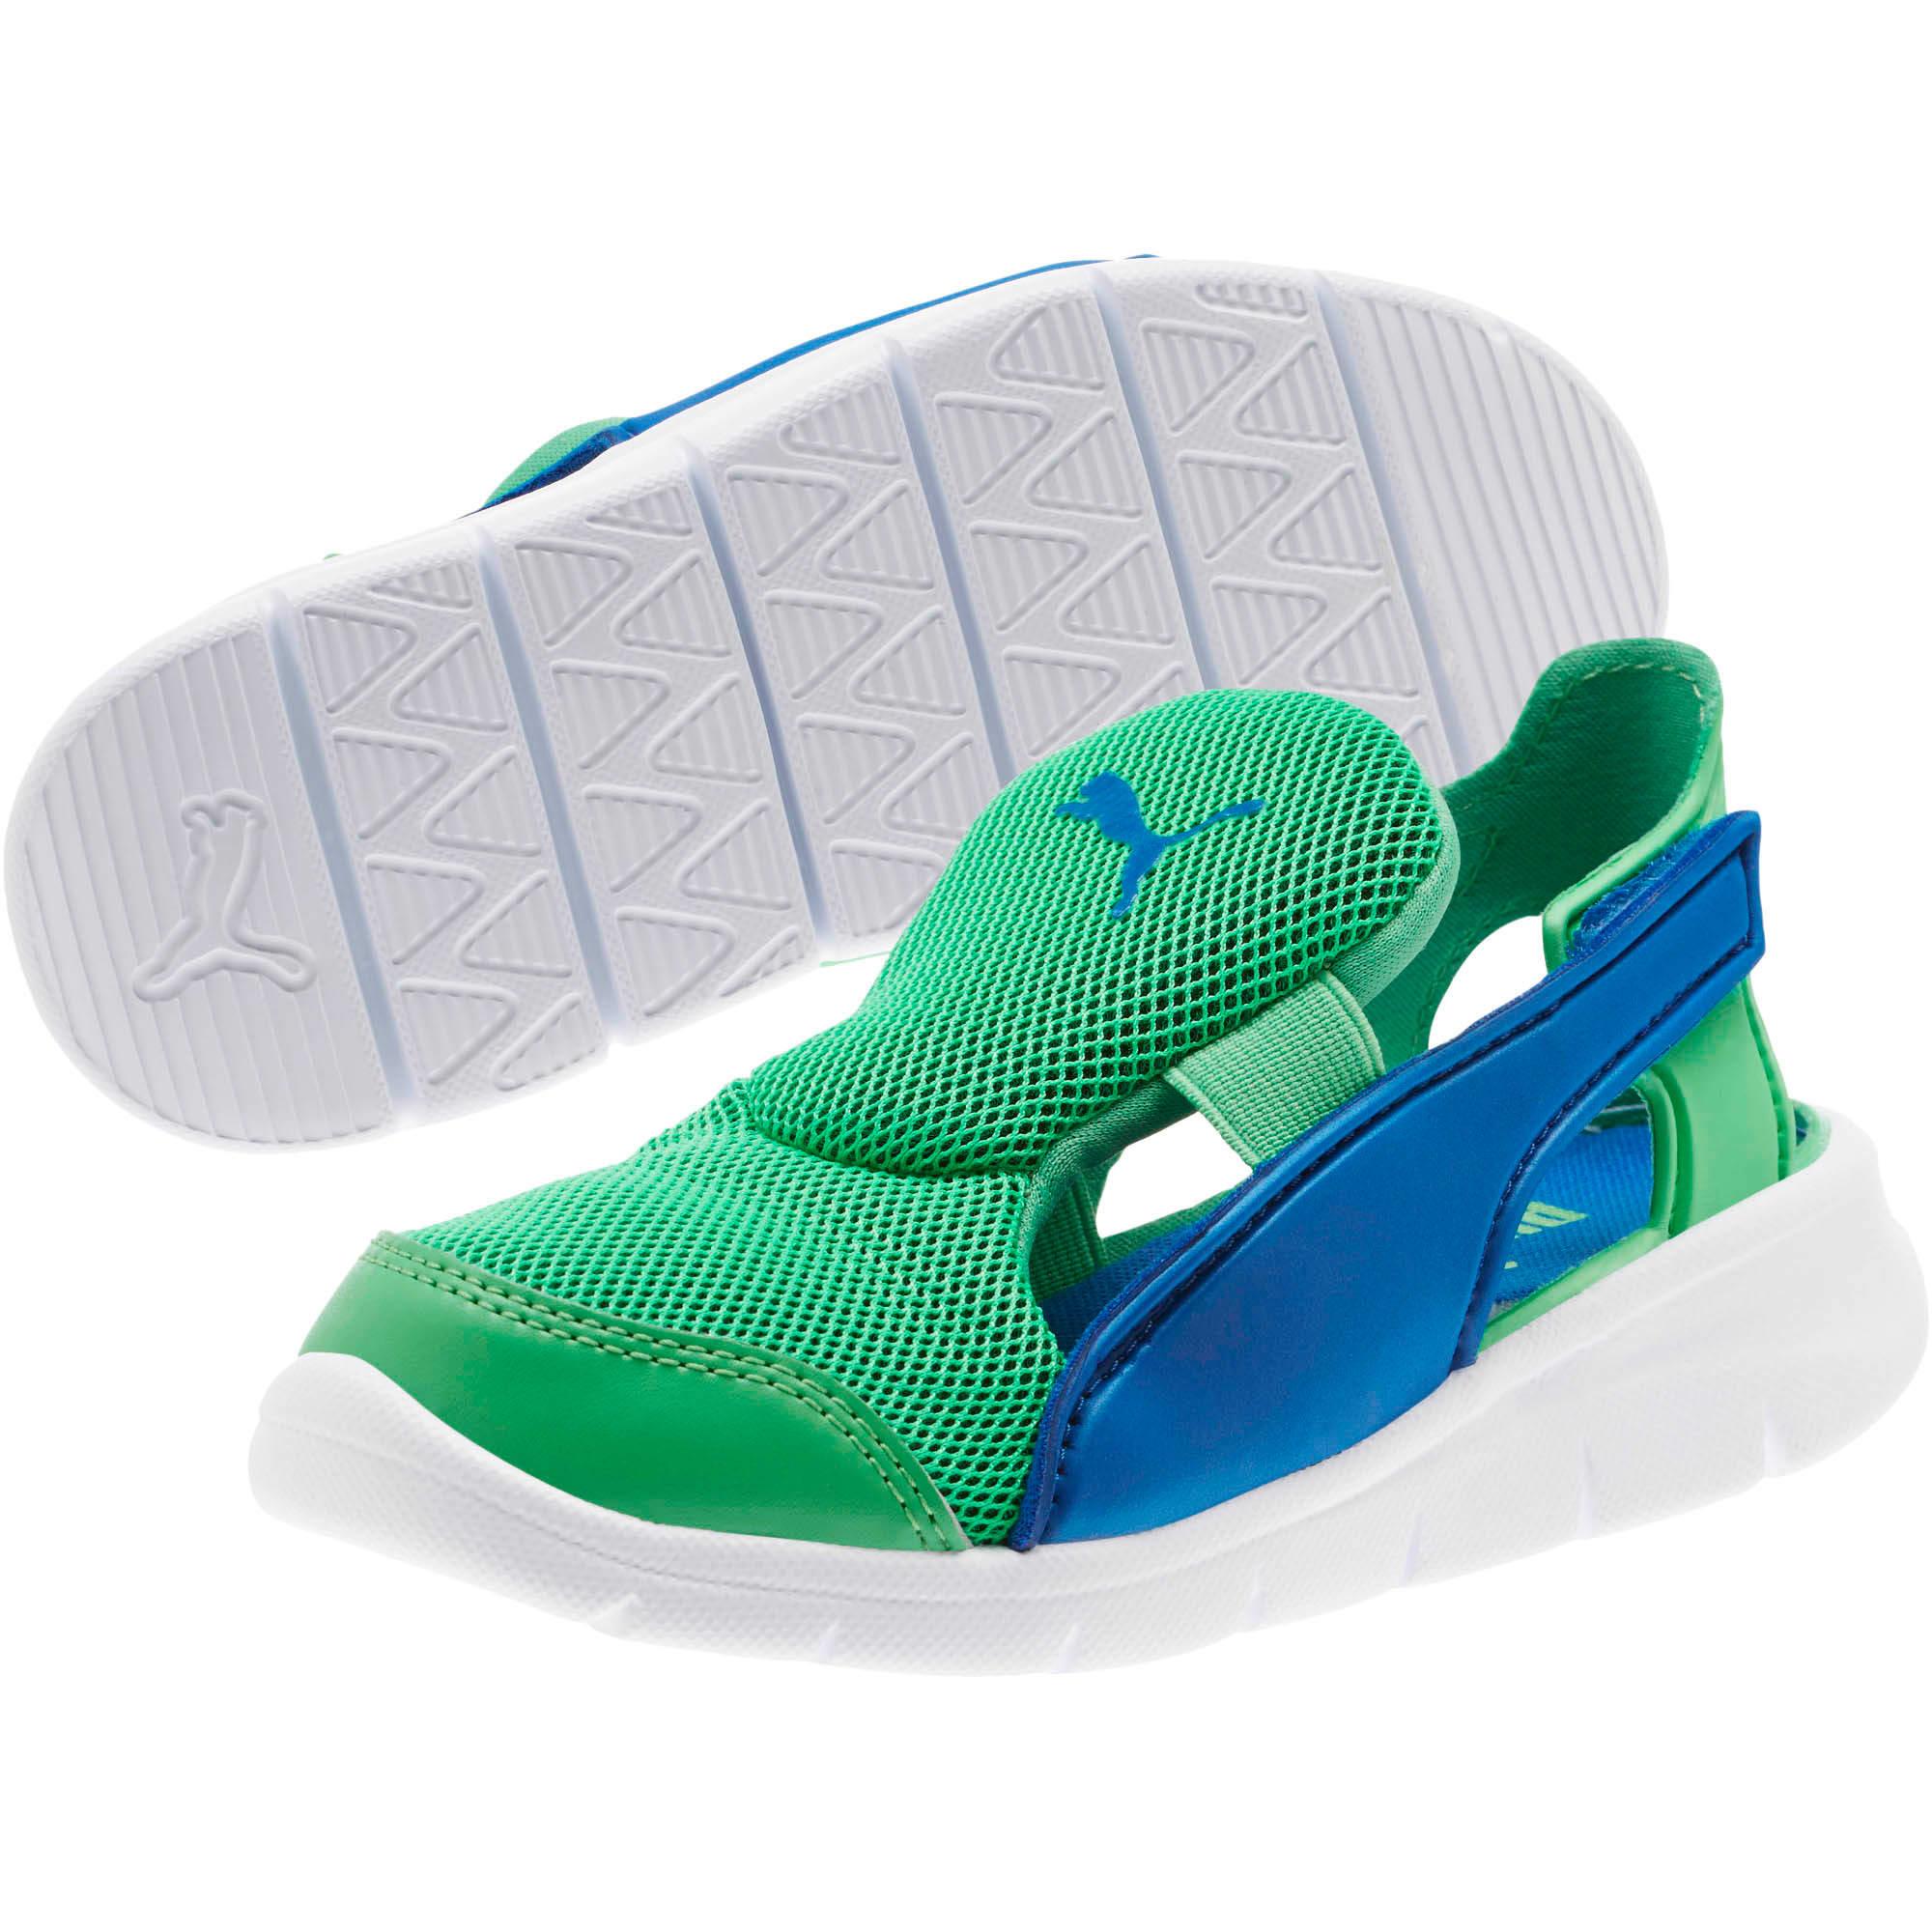 Thumbnail 2 of Bao 3 Open Little Kids' Shoes, Surf The Web-Irish Green, medium